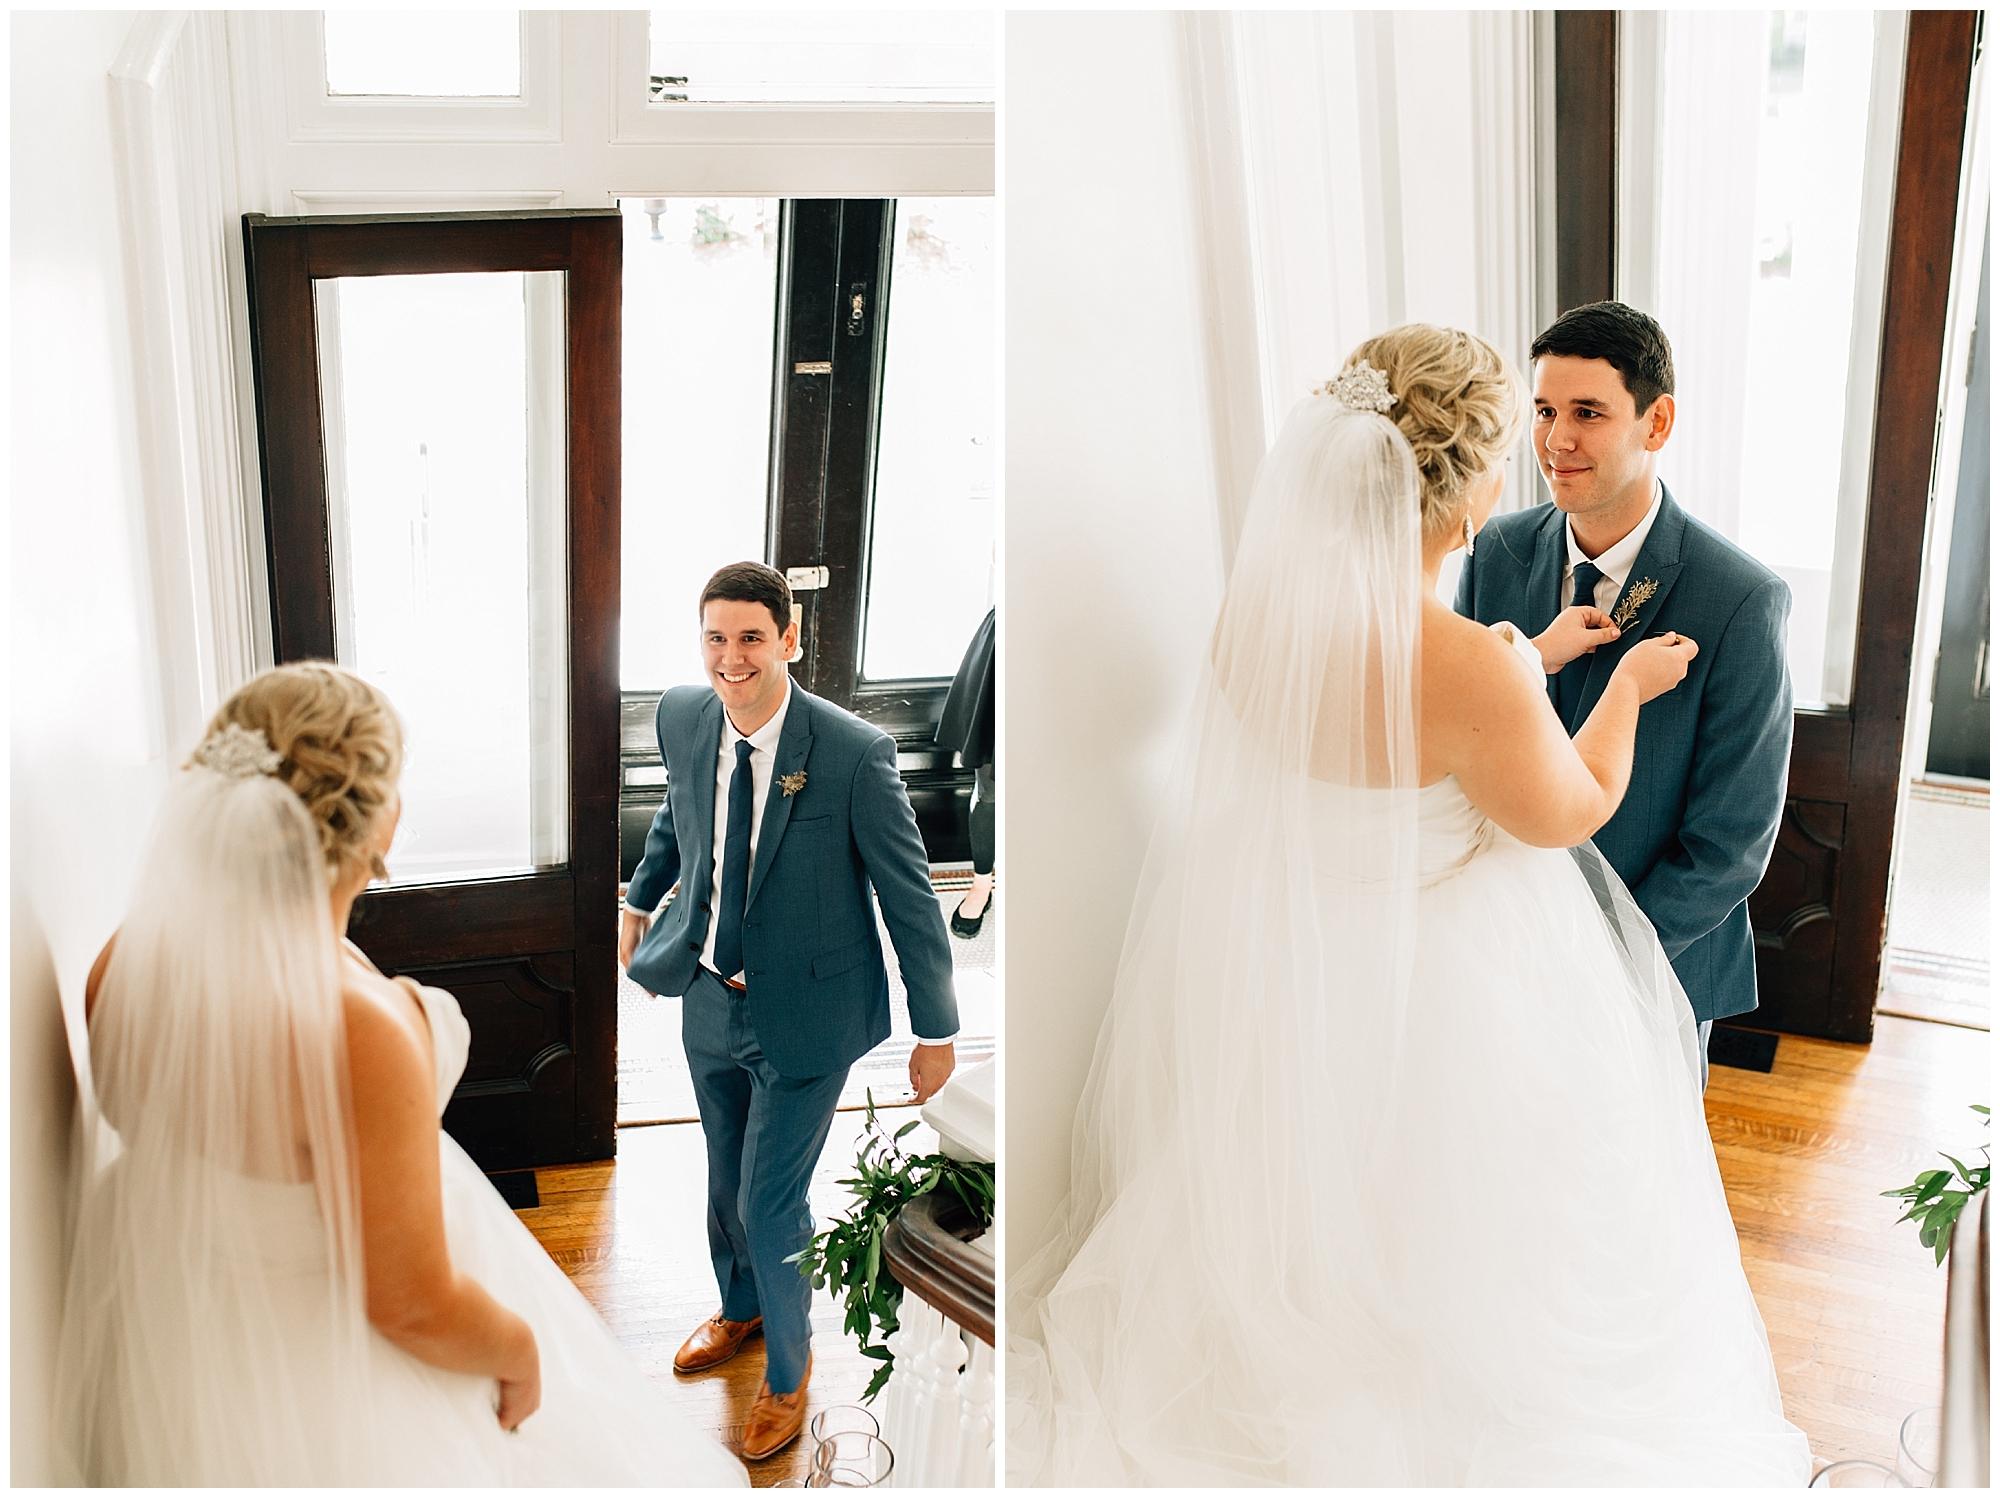 Merrimon-Wynne-Raleigh-Wedding-13.jpg